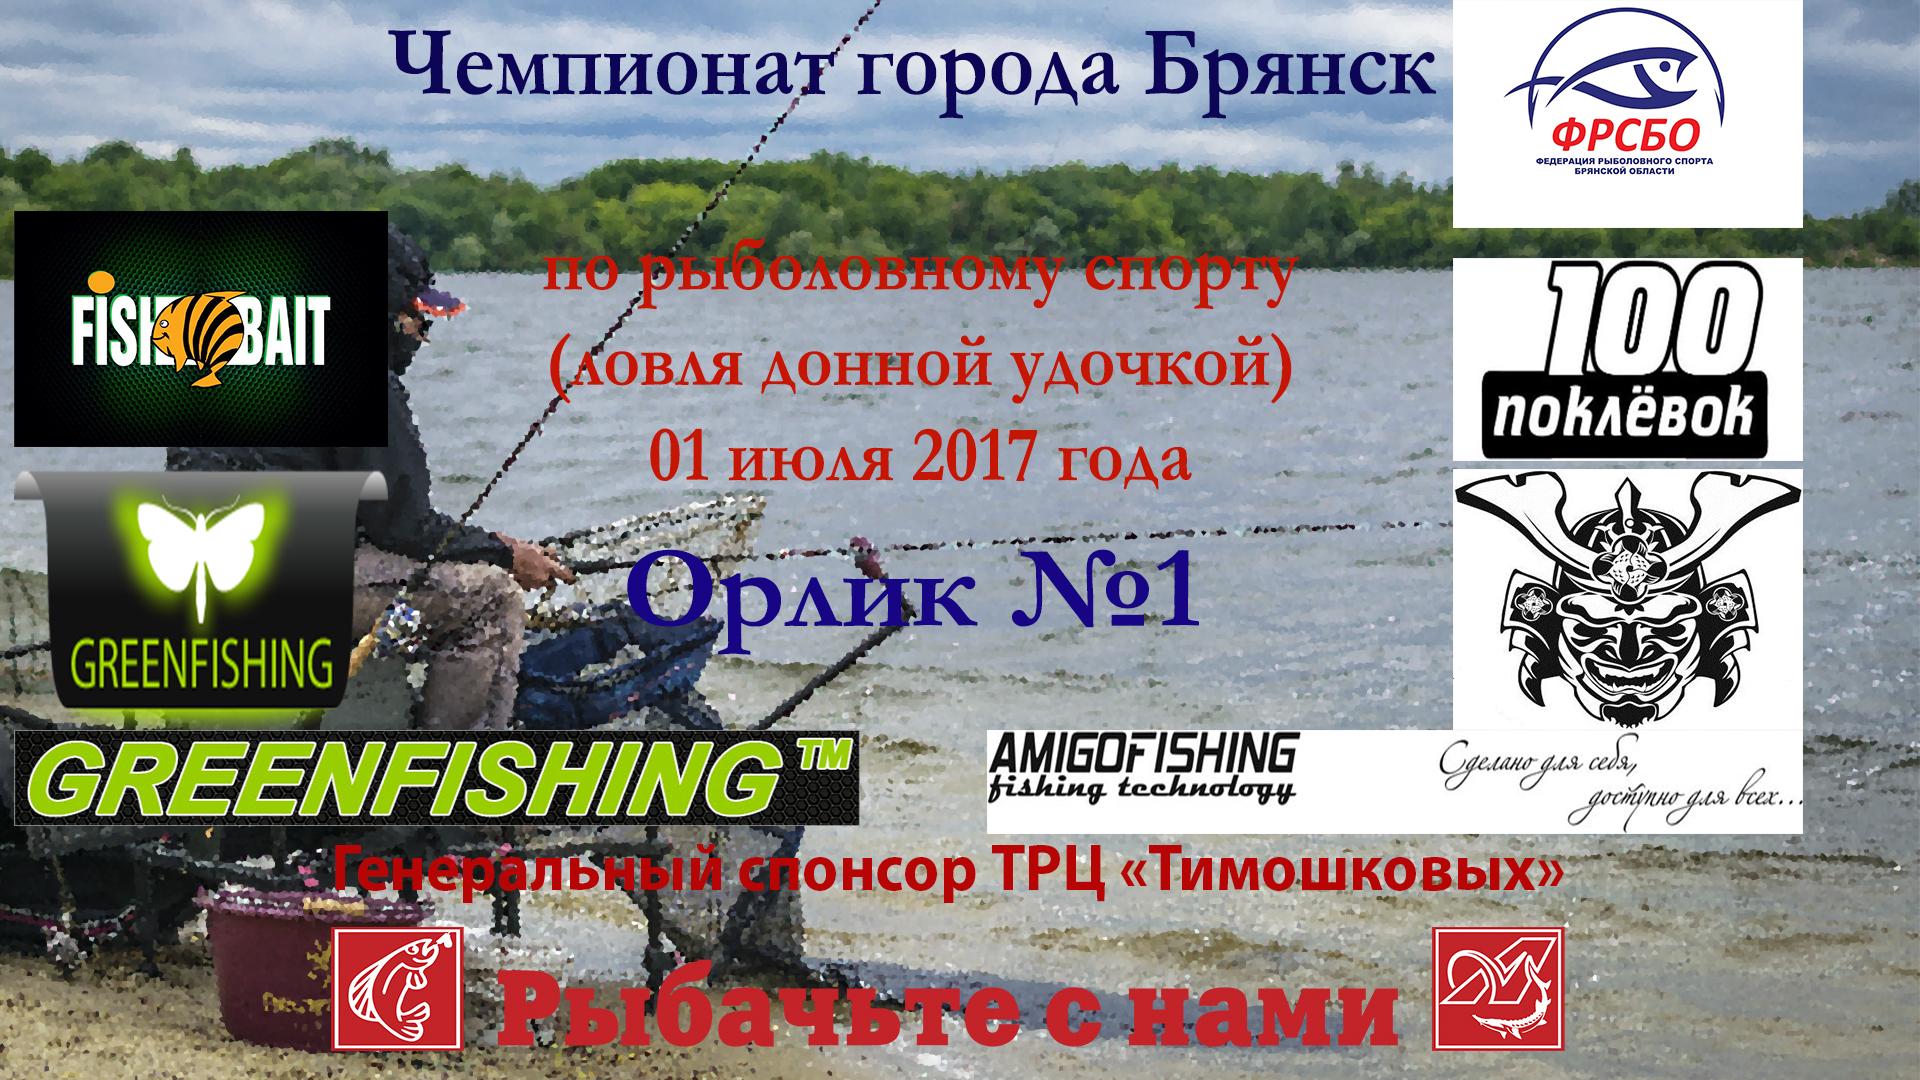 http://sh.uploads.ru/40Hgx.jpg